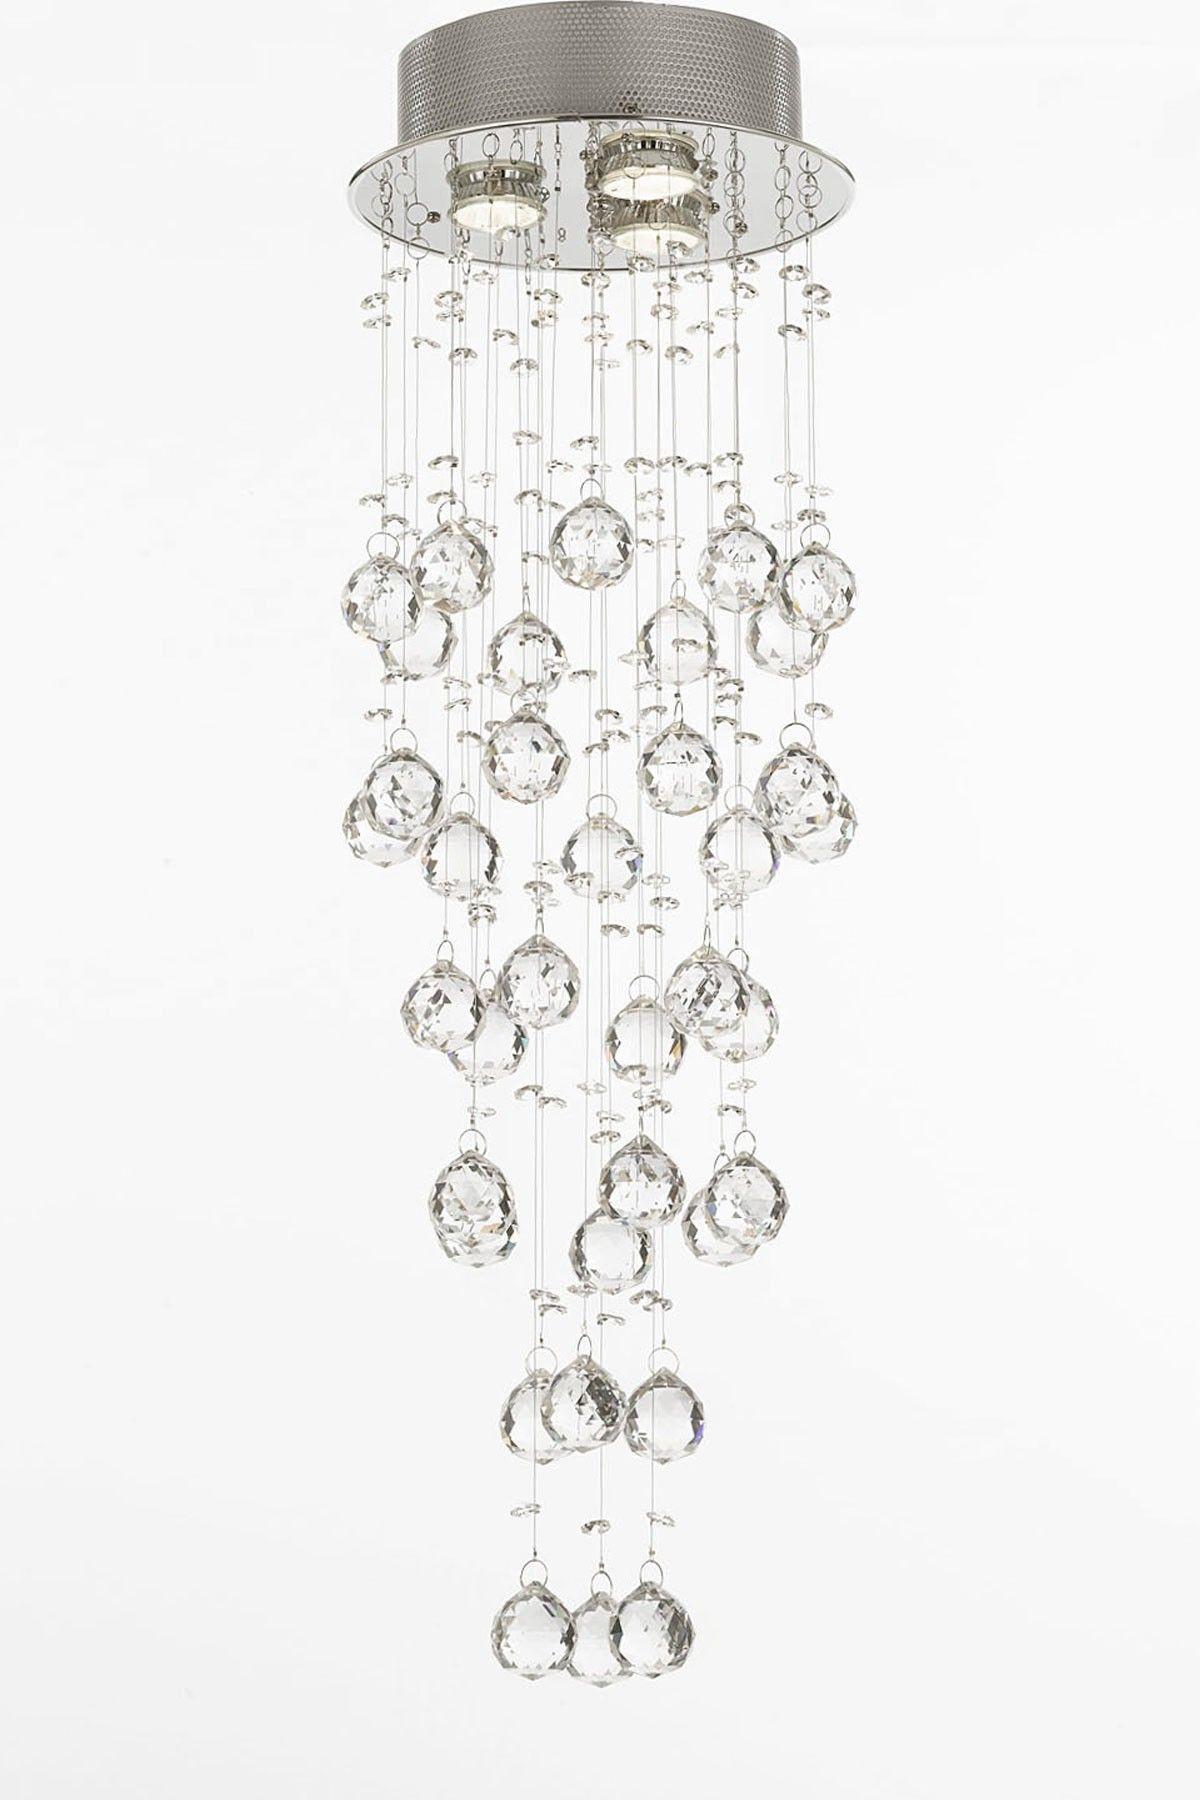 On Hautelook Gallery Chandeliers Modern Crystal Raindrop